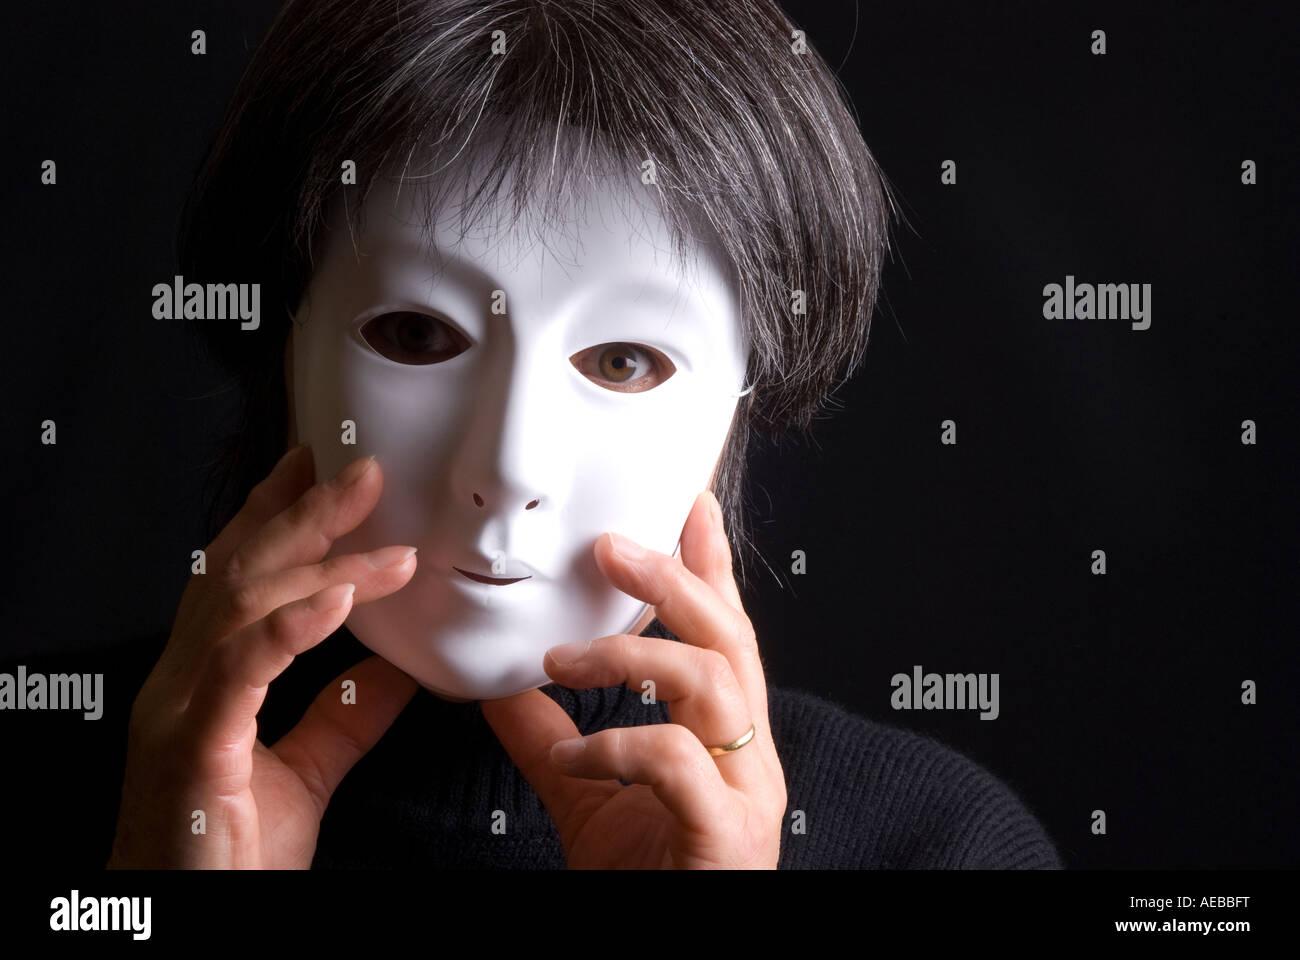 Woman wearing a plain white mask - Stock Image